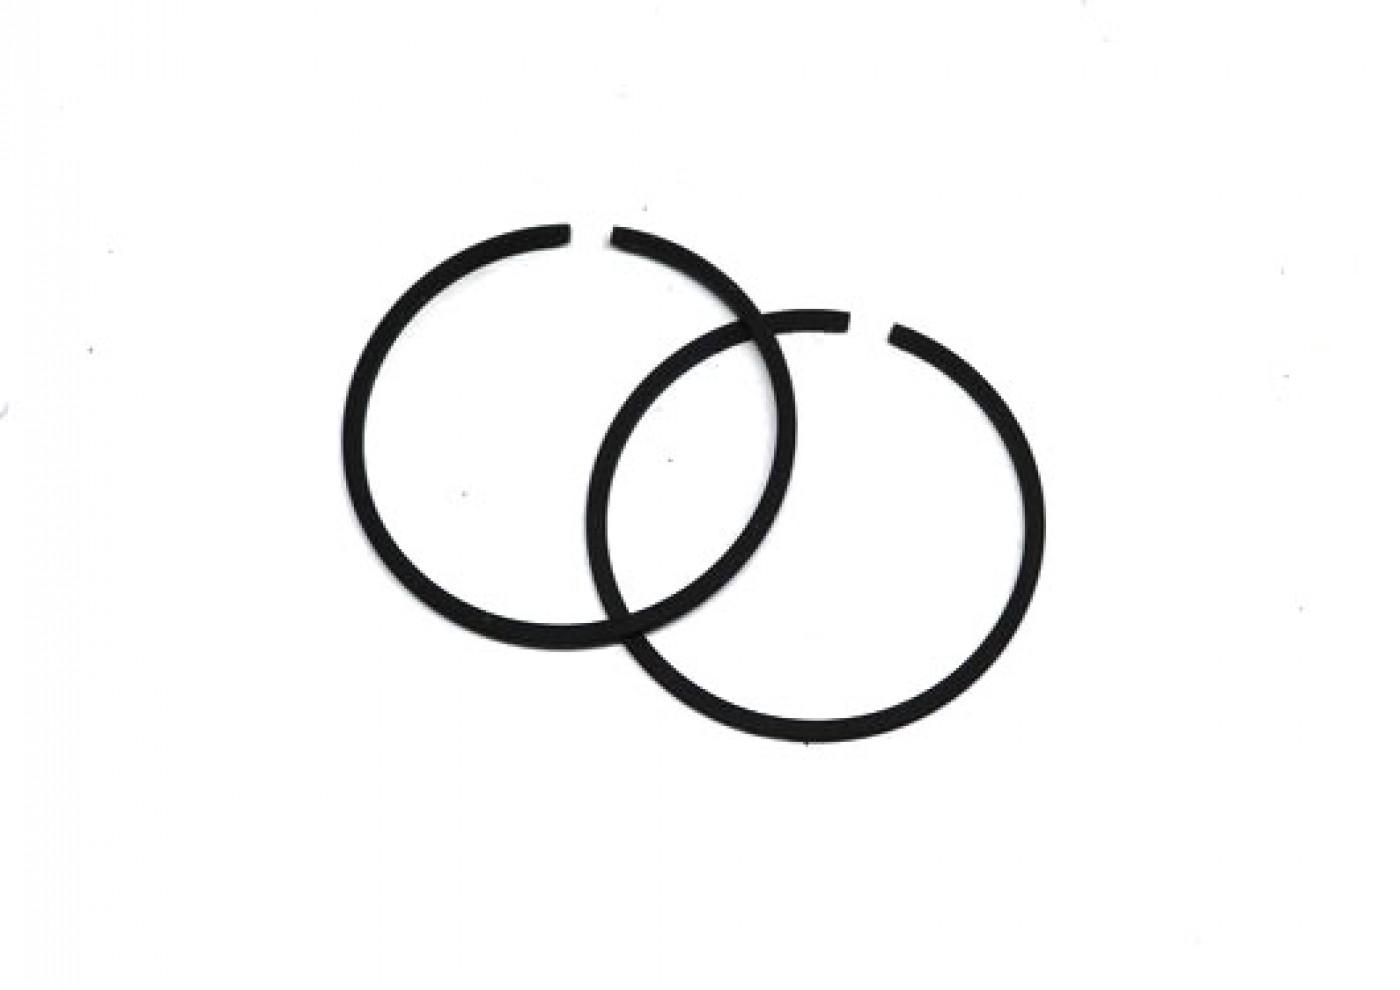 Sada kroužků 37 mm x 1,2 mm